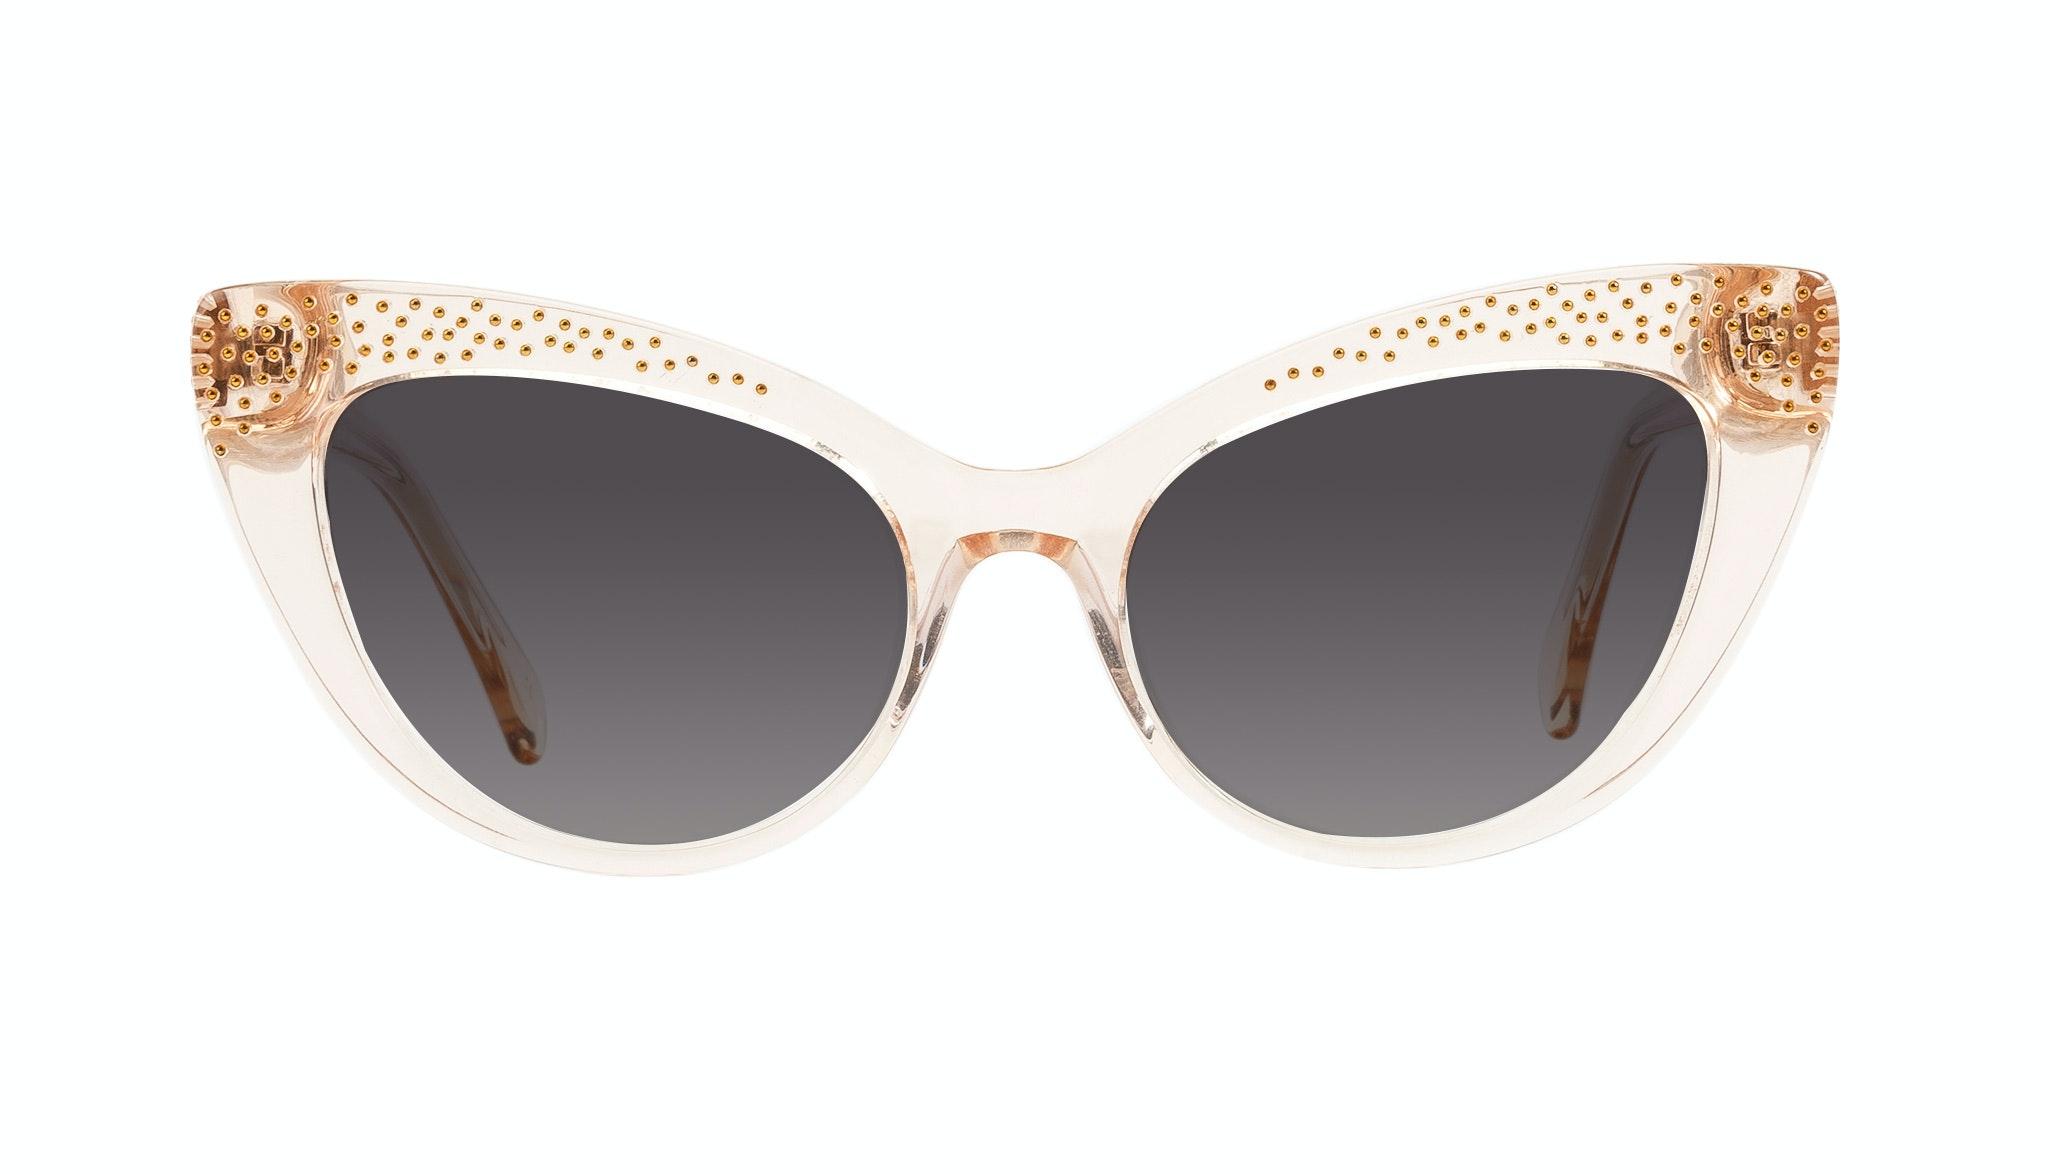 Affordable Fashion Glasses Cat Eye Sunglasses Women Keiko Shug Blond